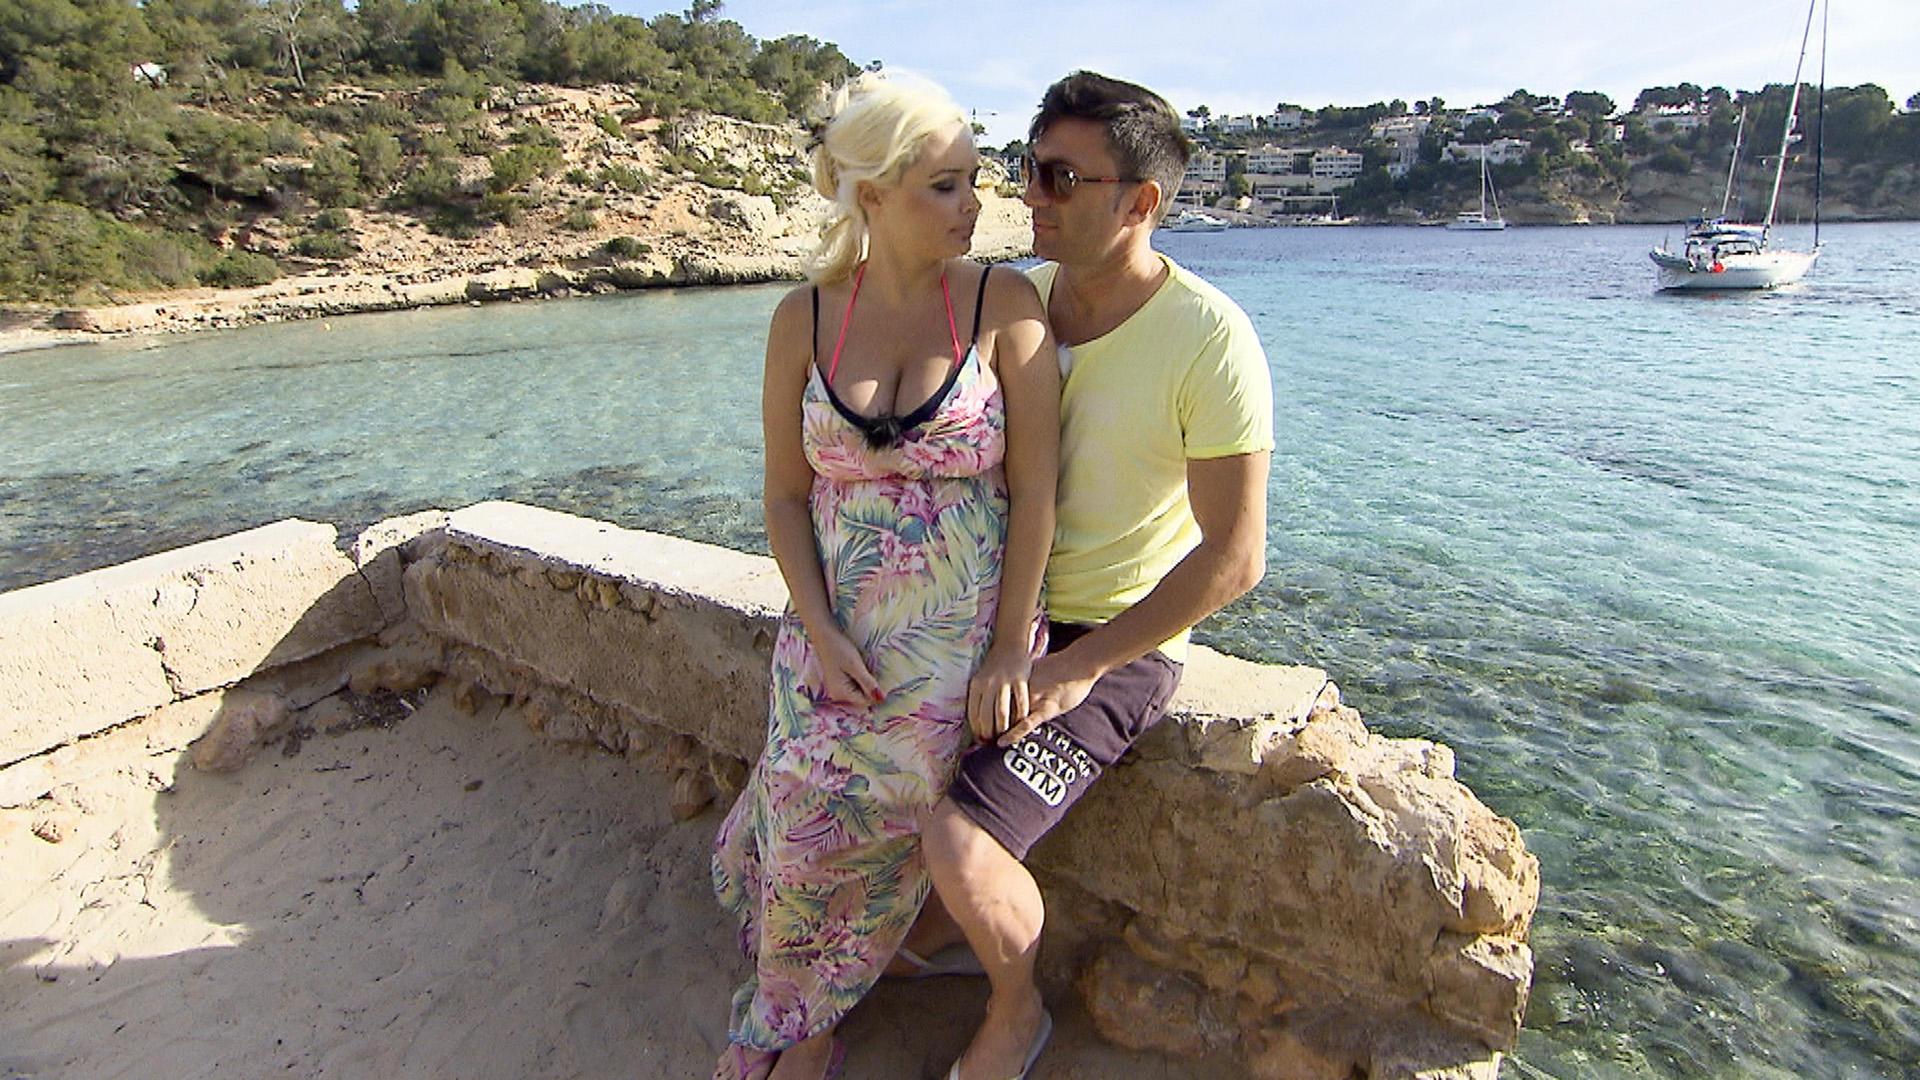 Entspannungsurlaub auf Mallorca | Folge 2